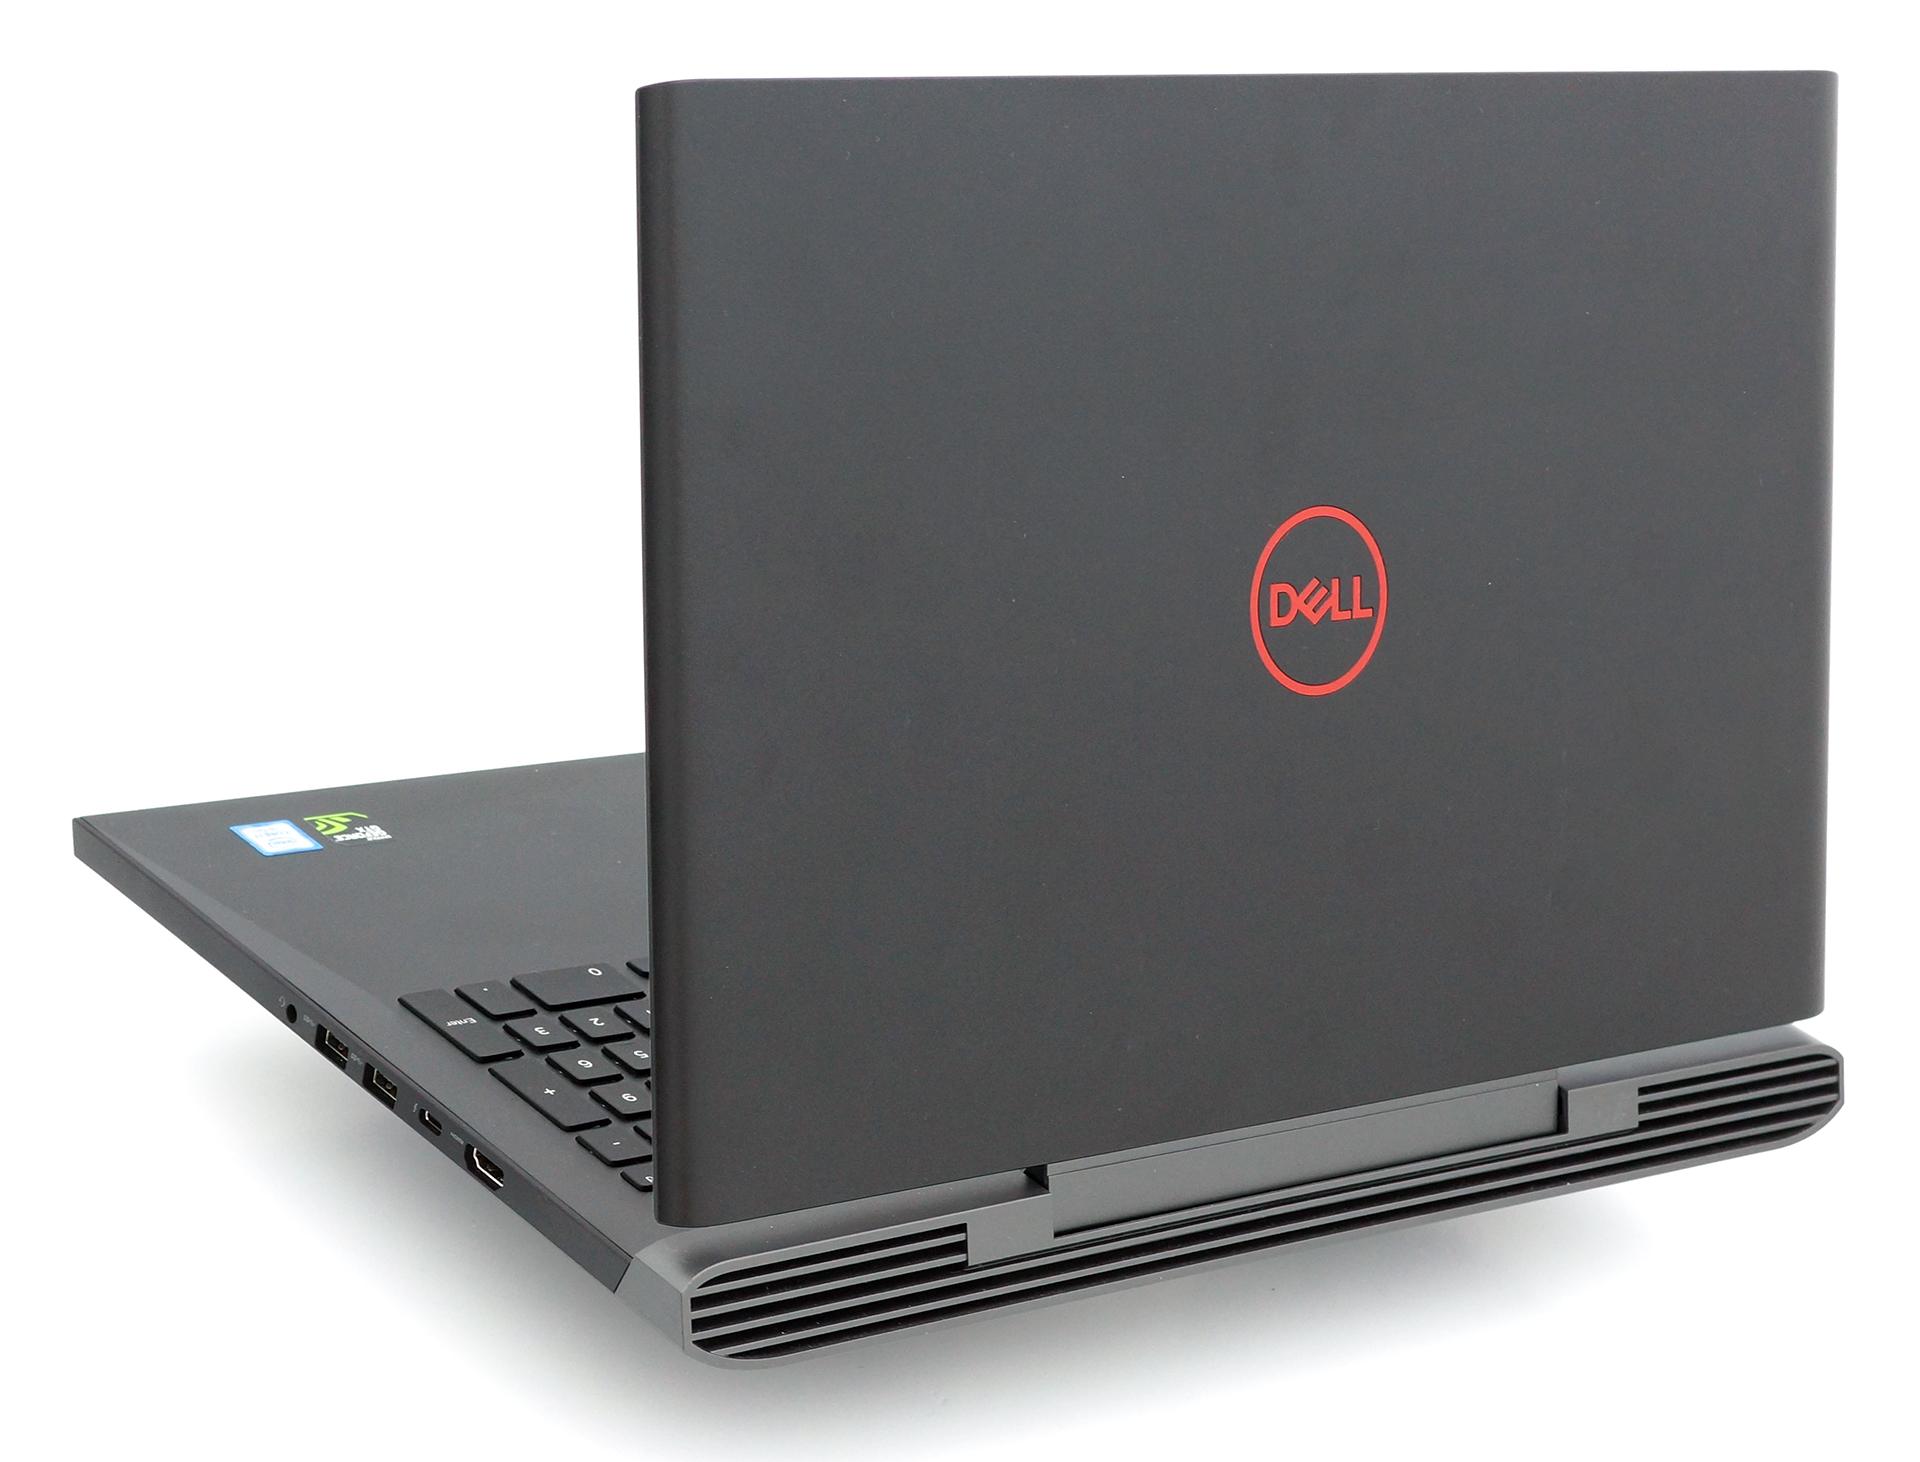 Dell Inspiron 15 7577 Gtx 1060 Max Q Review Improved But Still Garskin Skin Laptop Netbook 14 Despite